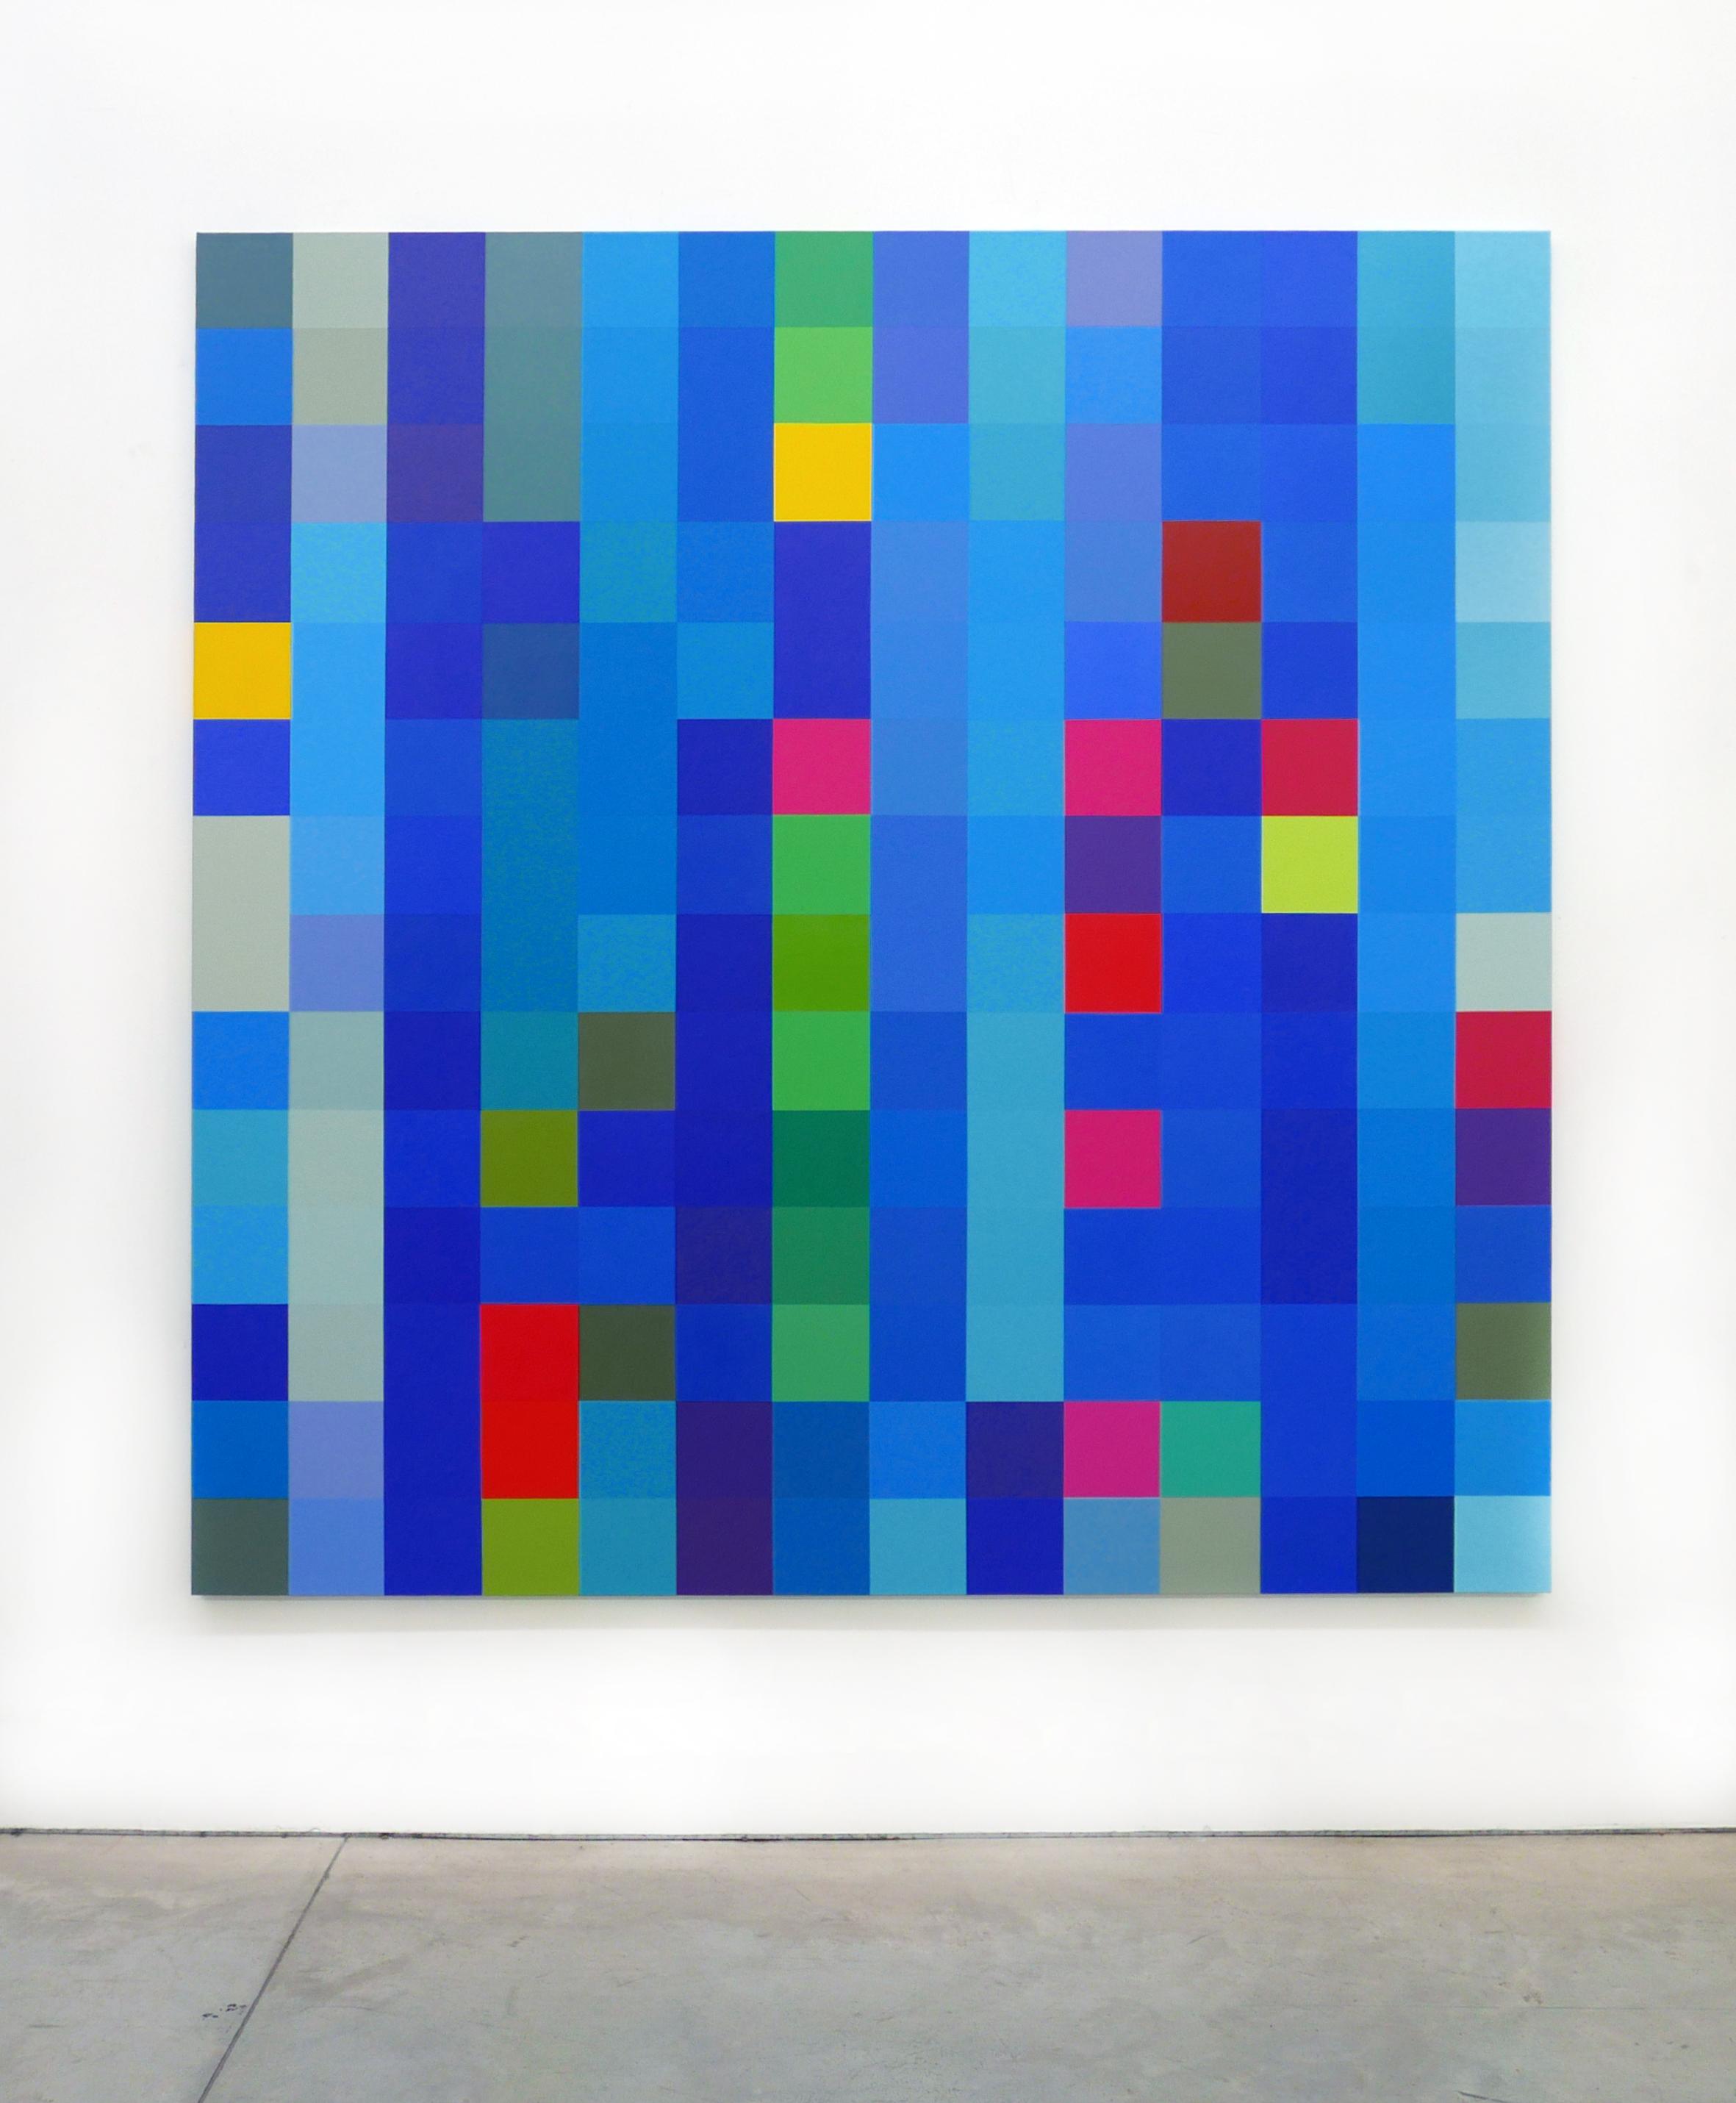 Flickering Light #3 (Ocean Road) , 2004 - 2017, Synthetic polymer paint on linen, 198 x 198 cm